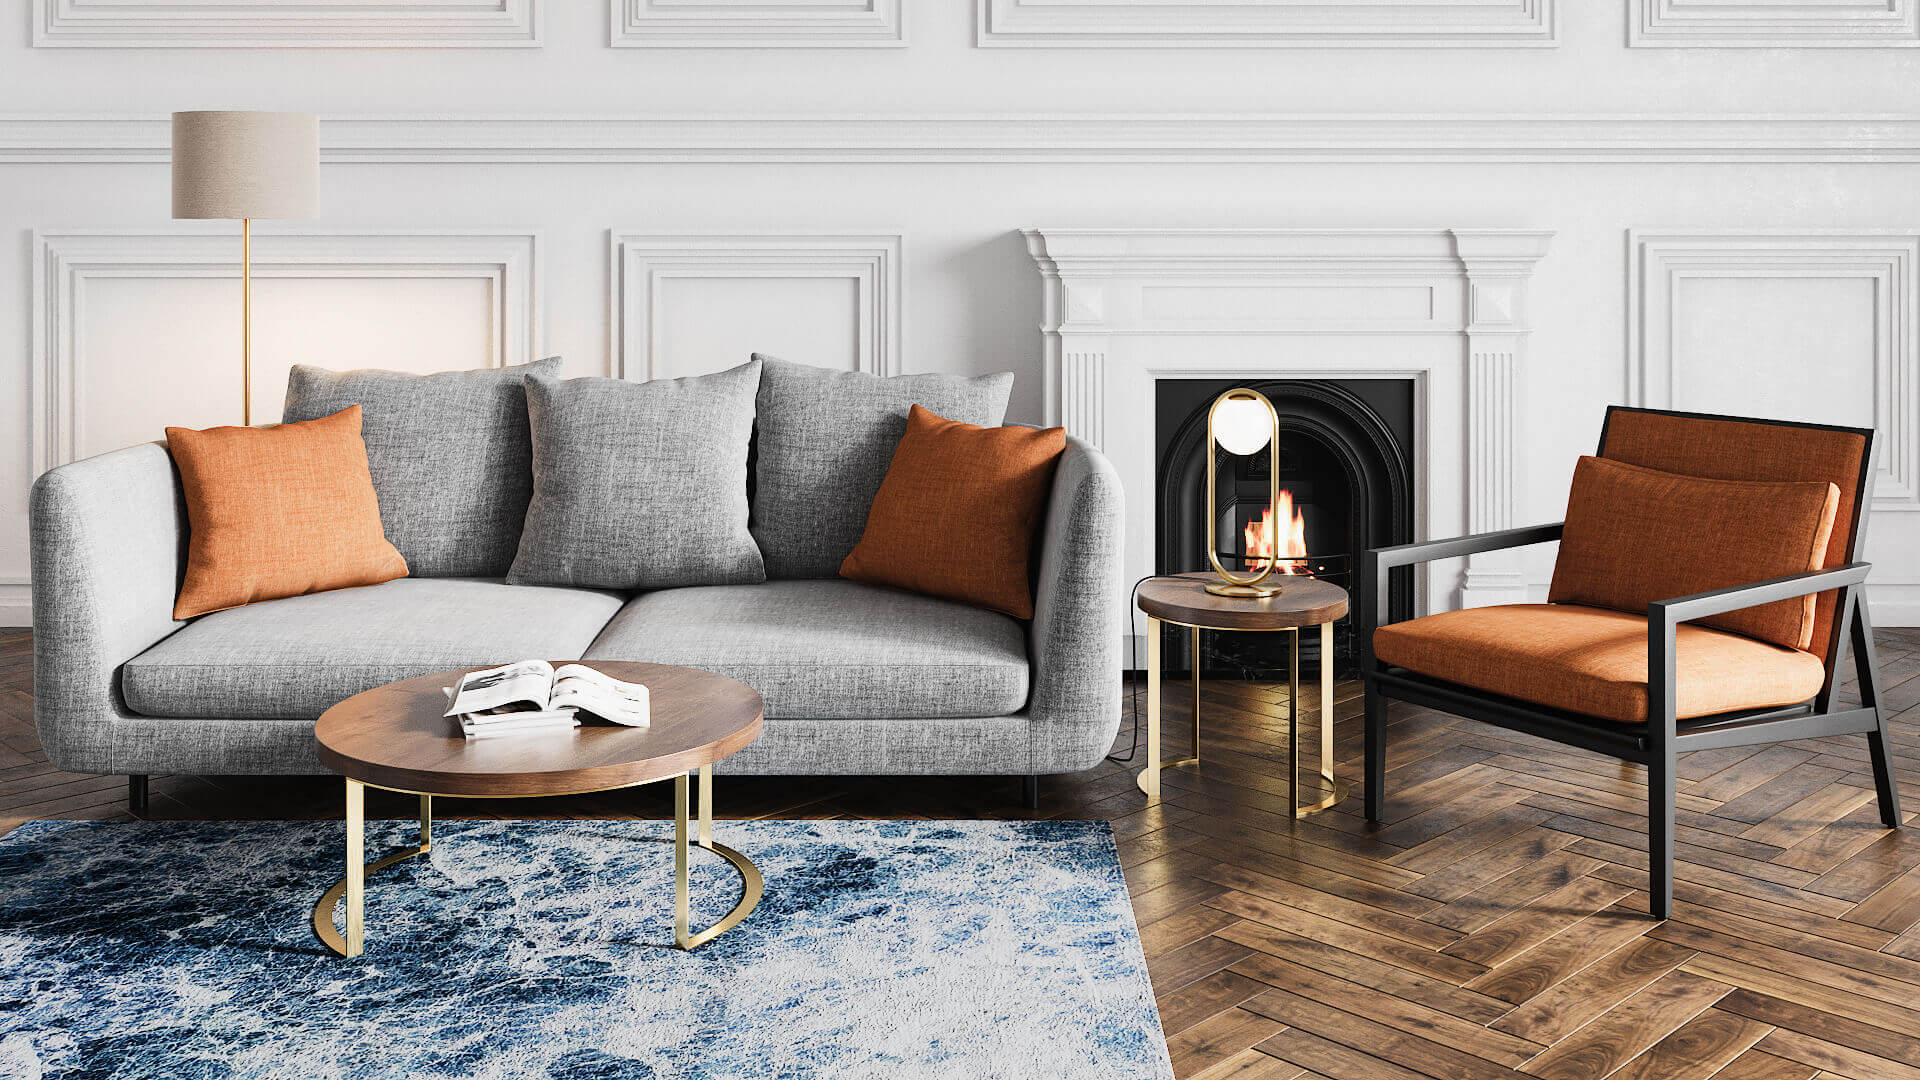 3D Rendering of a Grey Sofa